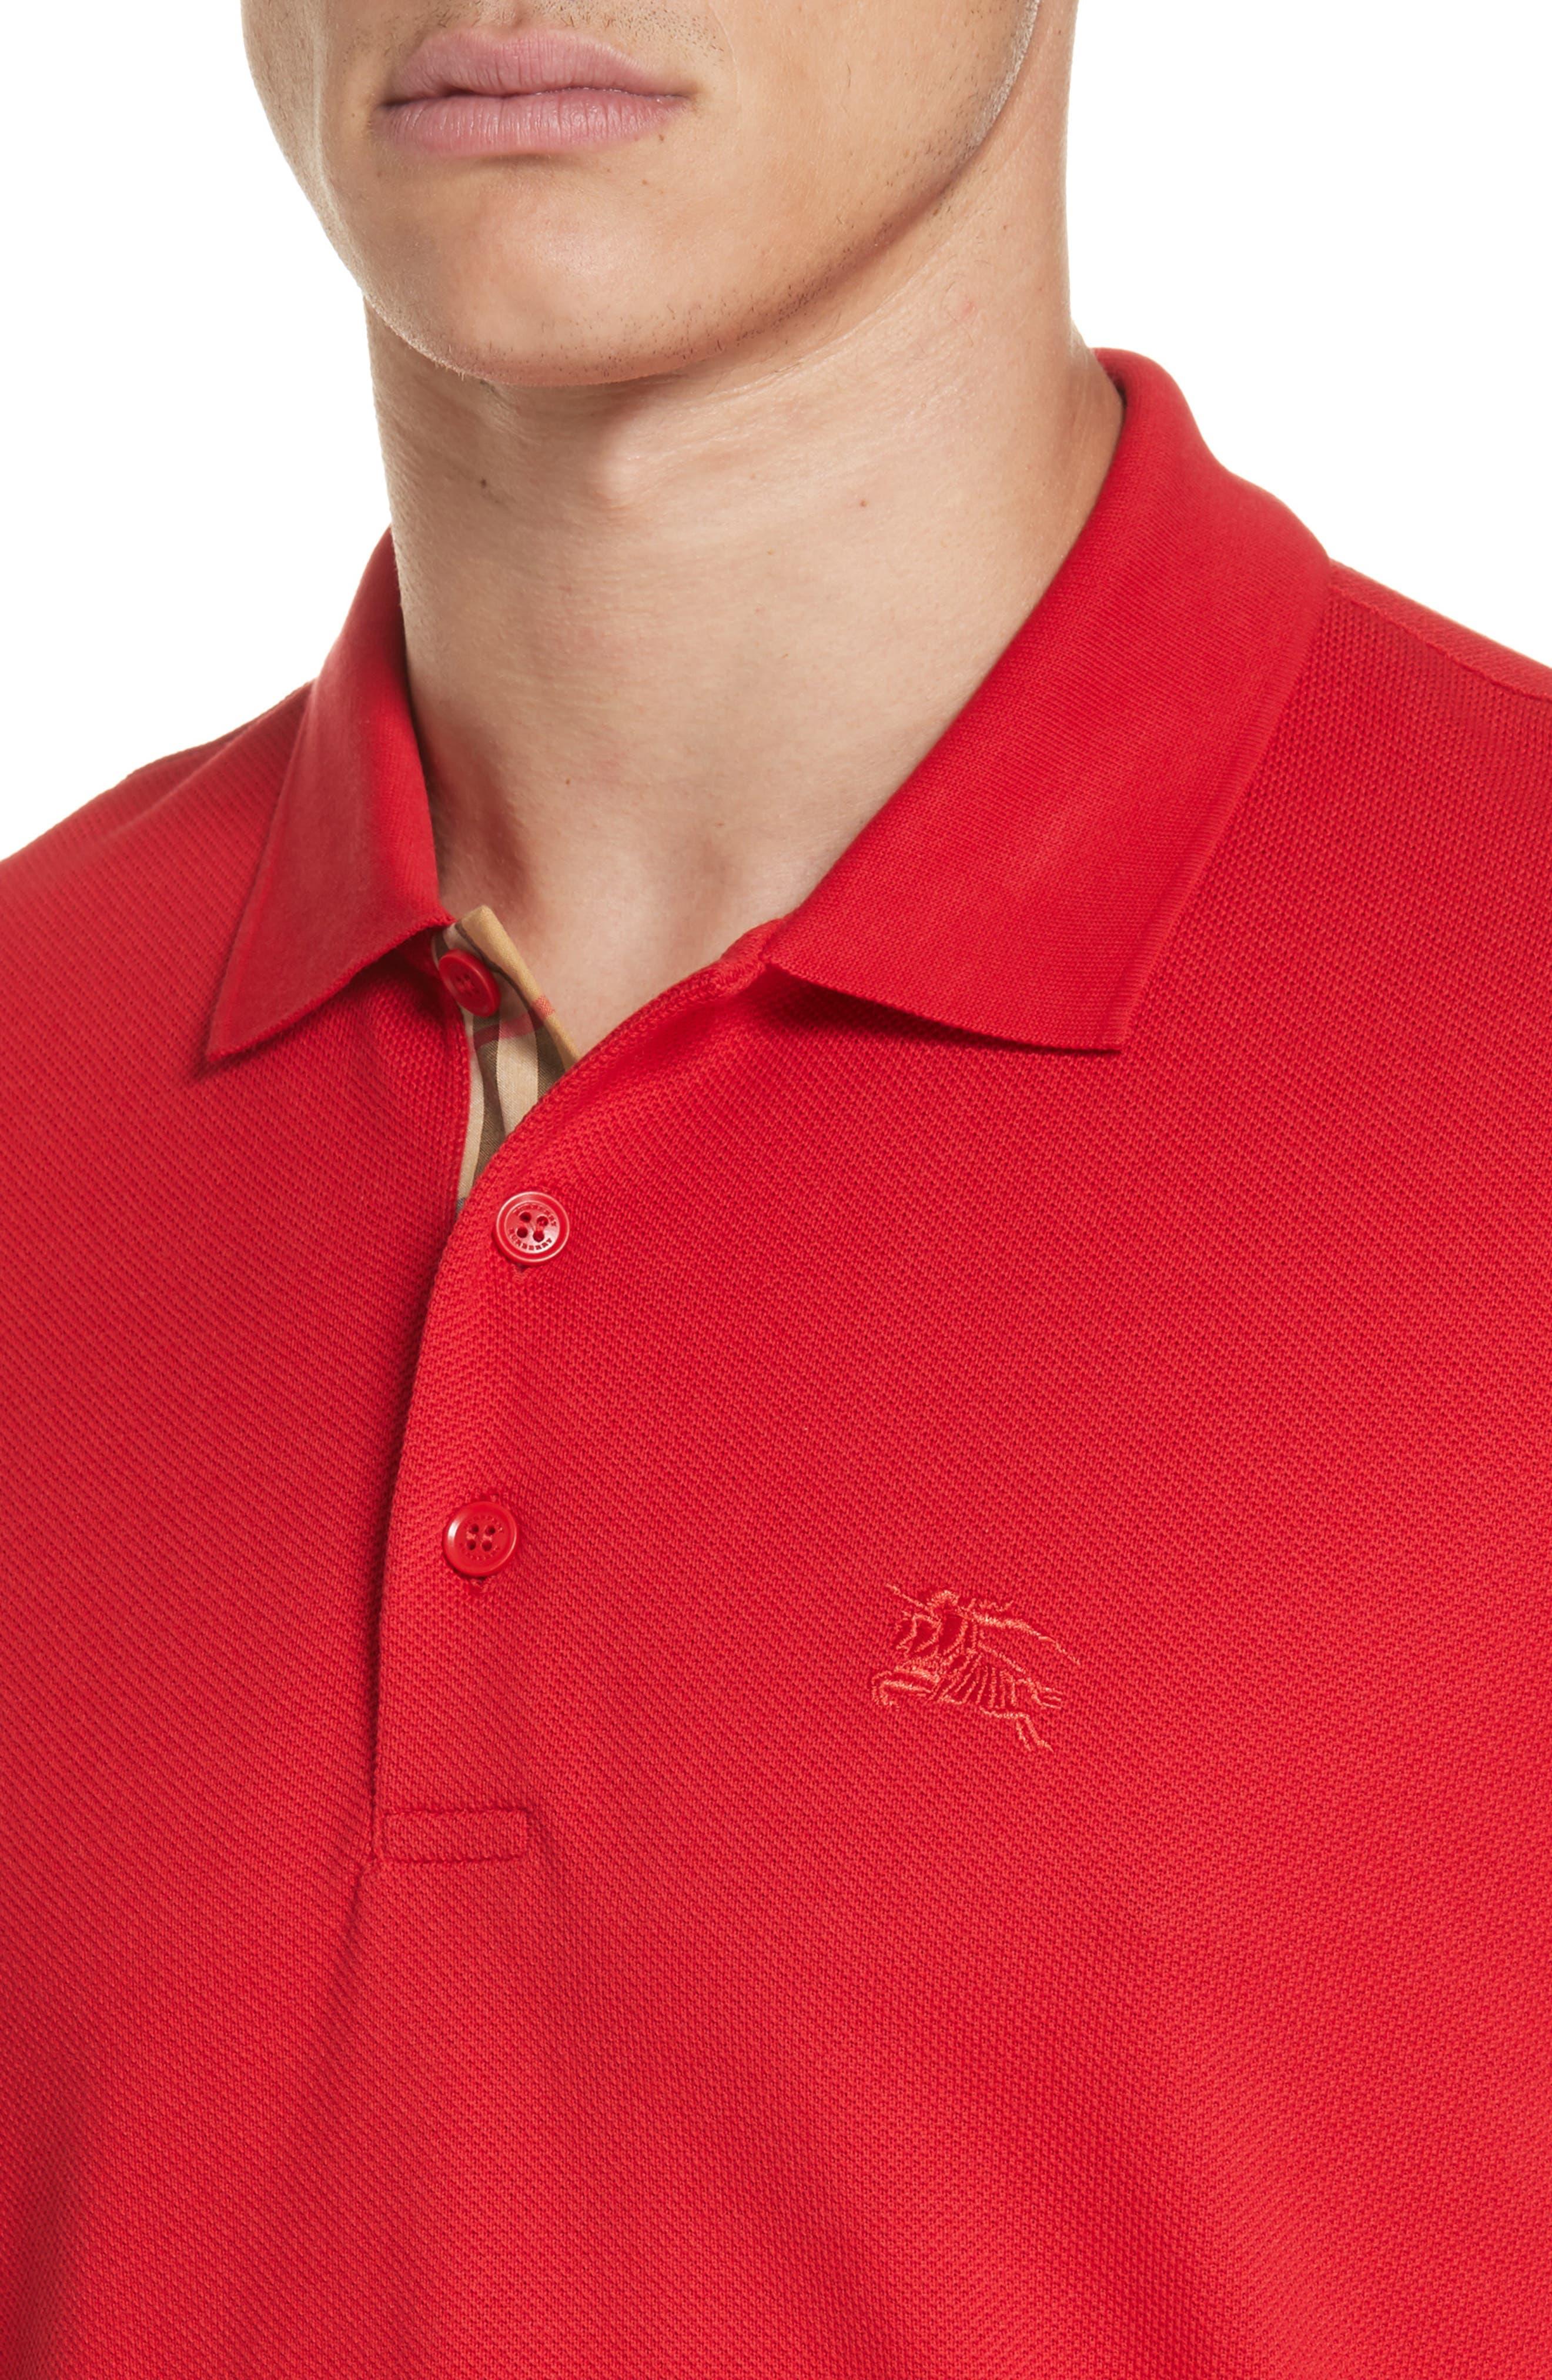 Hartford Piqué Polo,                             Alternate thumbnail 4, color,                             MILITARY RED